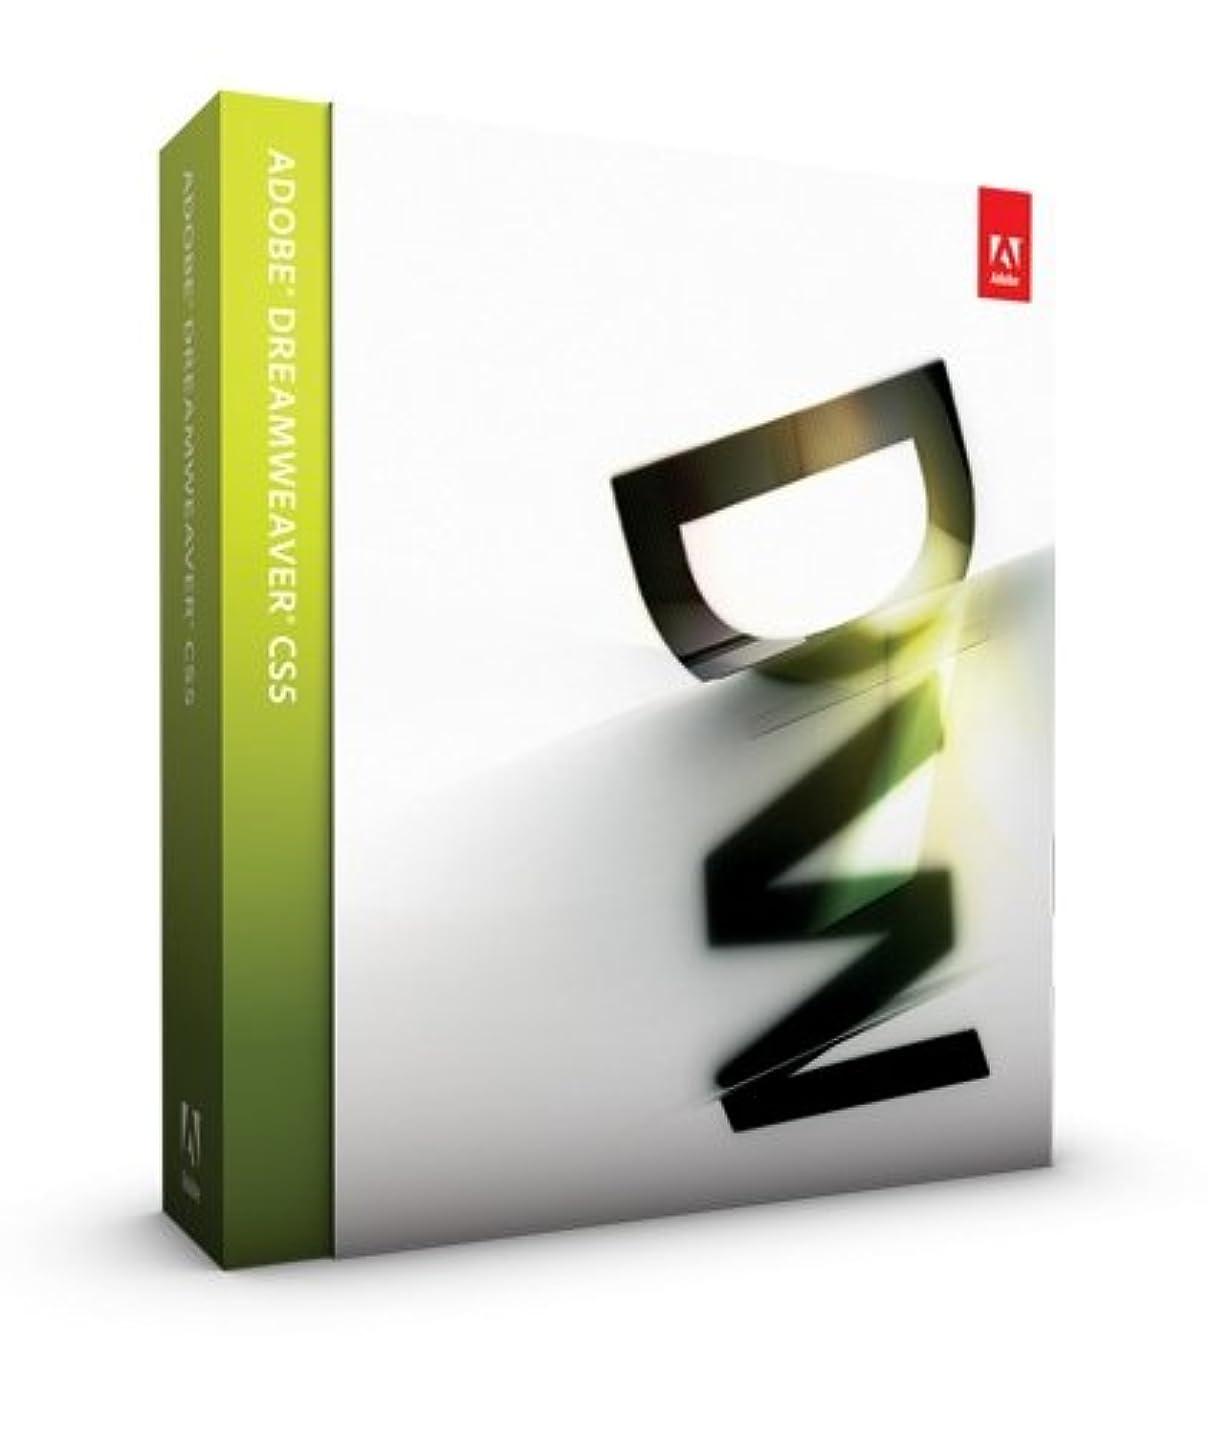 過去ファウル形成Adobe Dreamweaver CS5 Windows版 (旧製品)